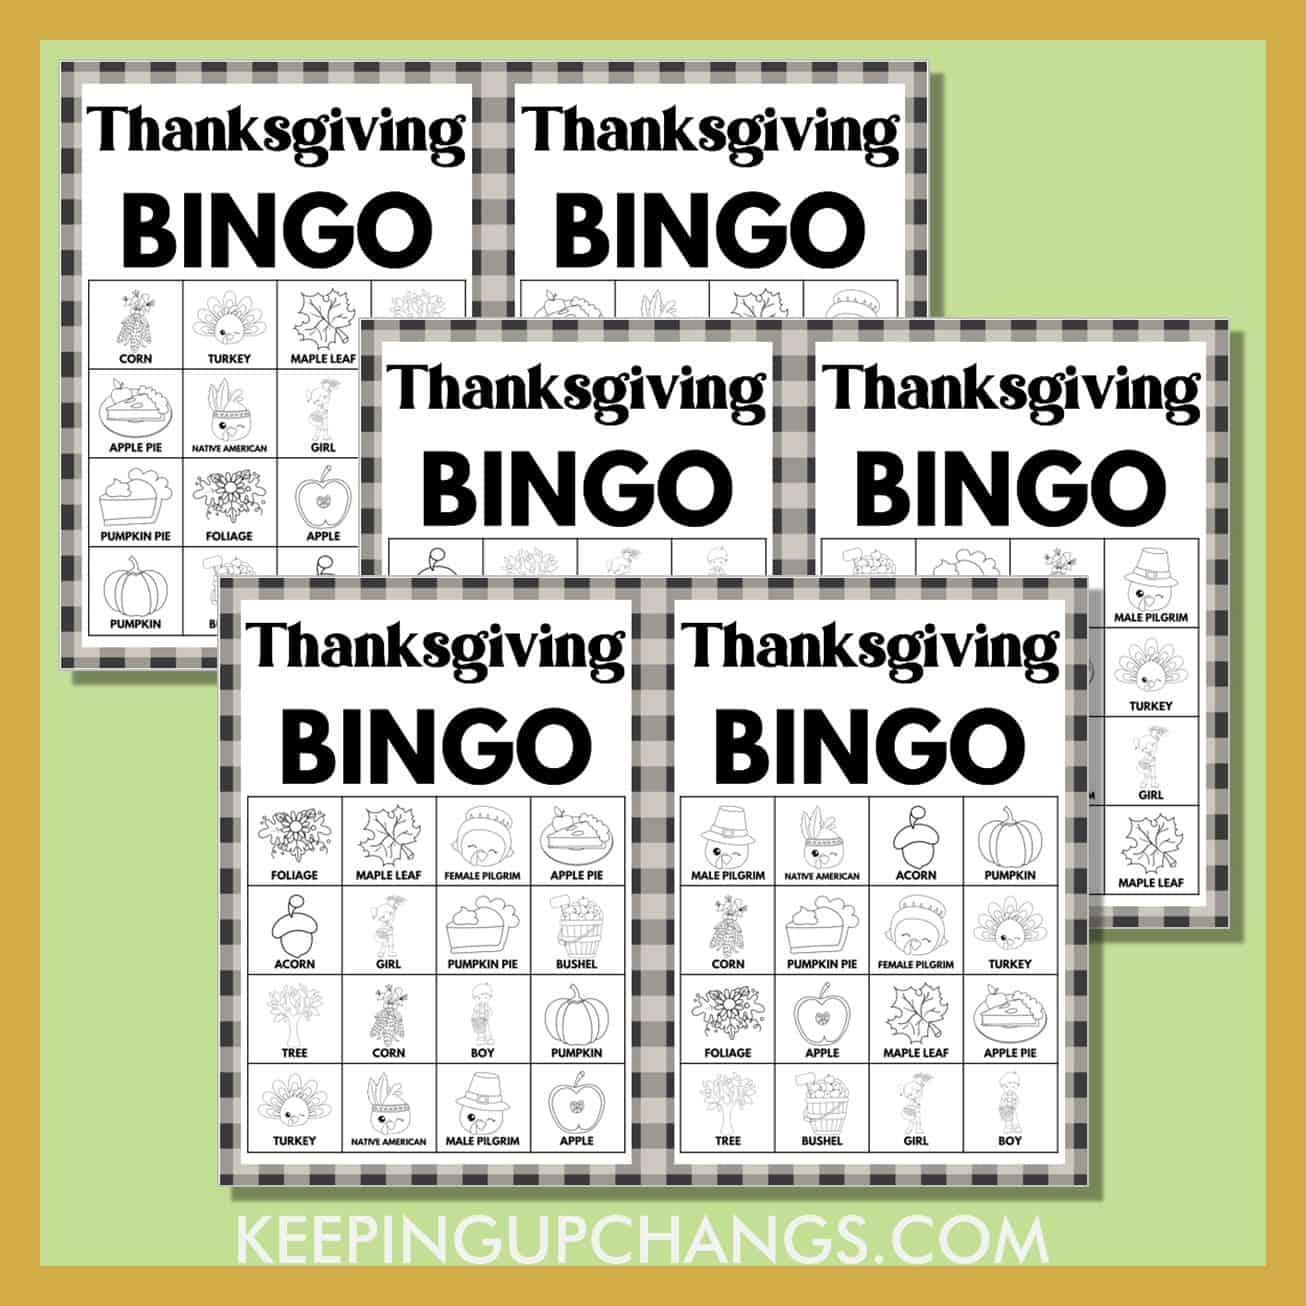 free fall thanksgiving bingo 4x4 black white coloring game cards.